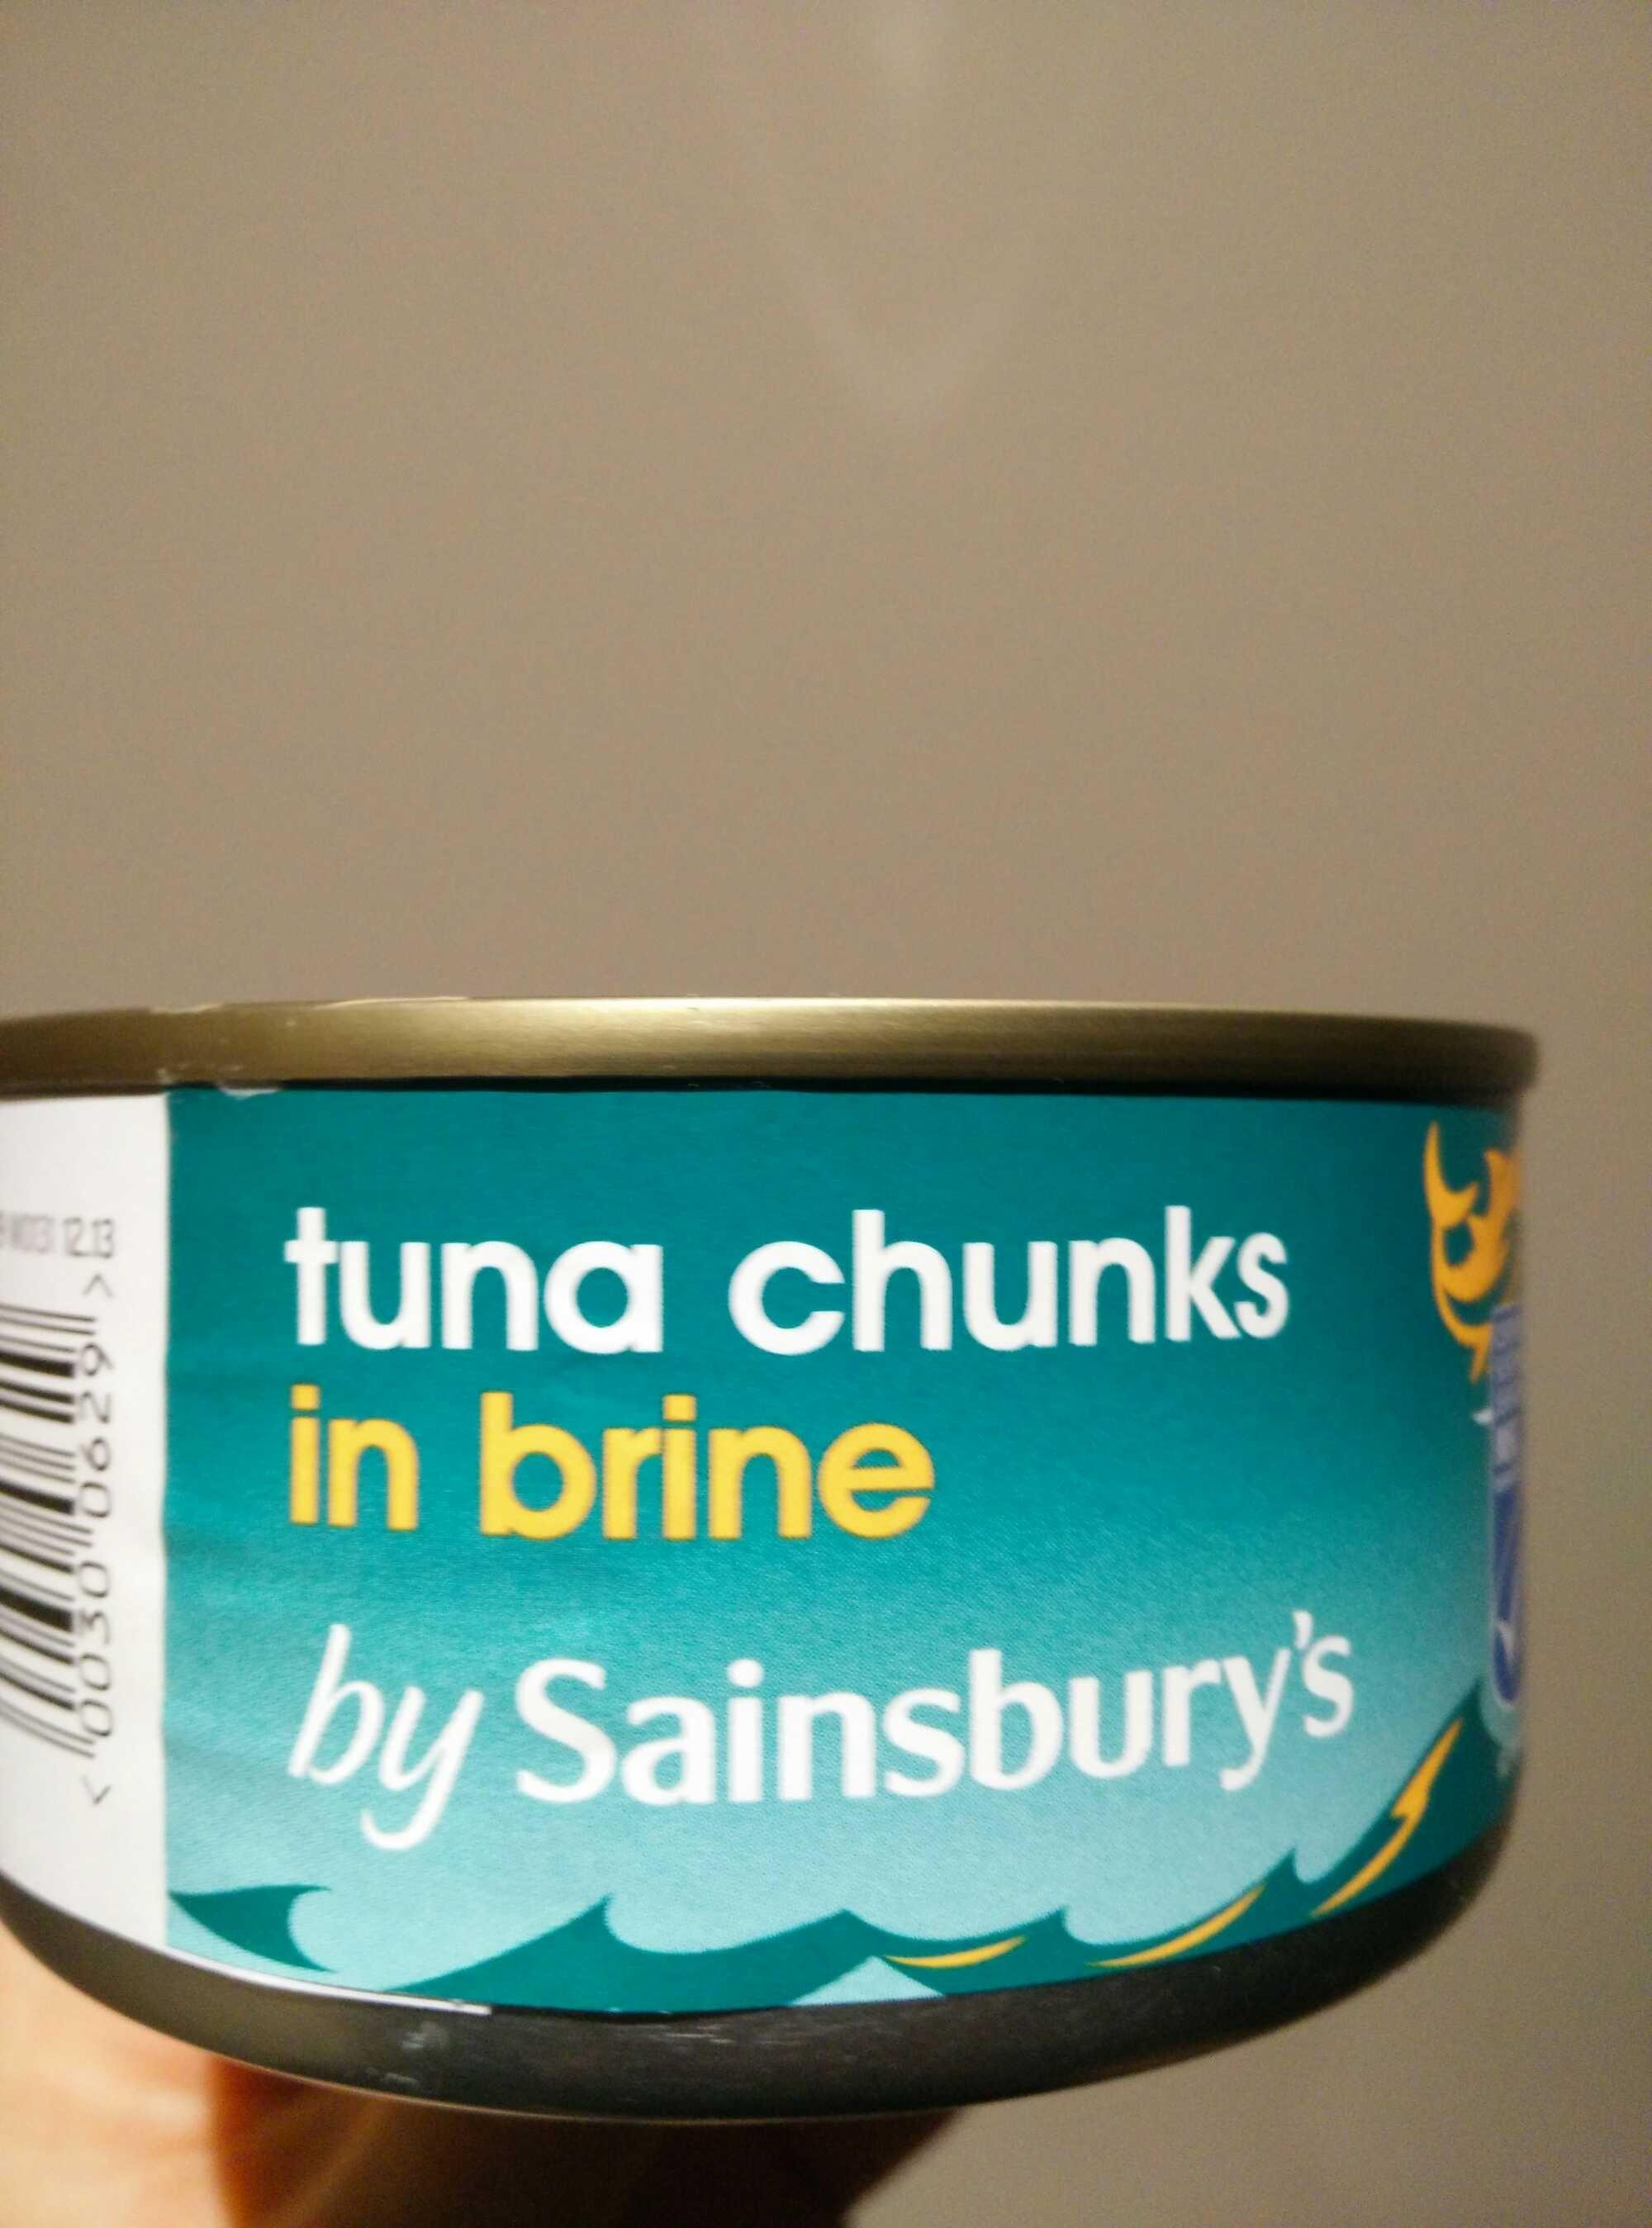 tuna chunks in brine - Product